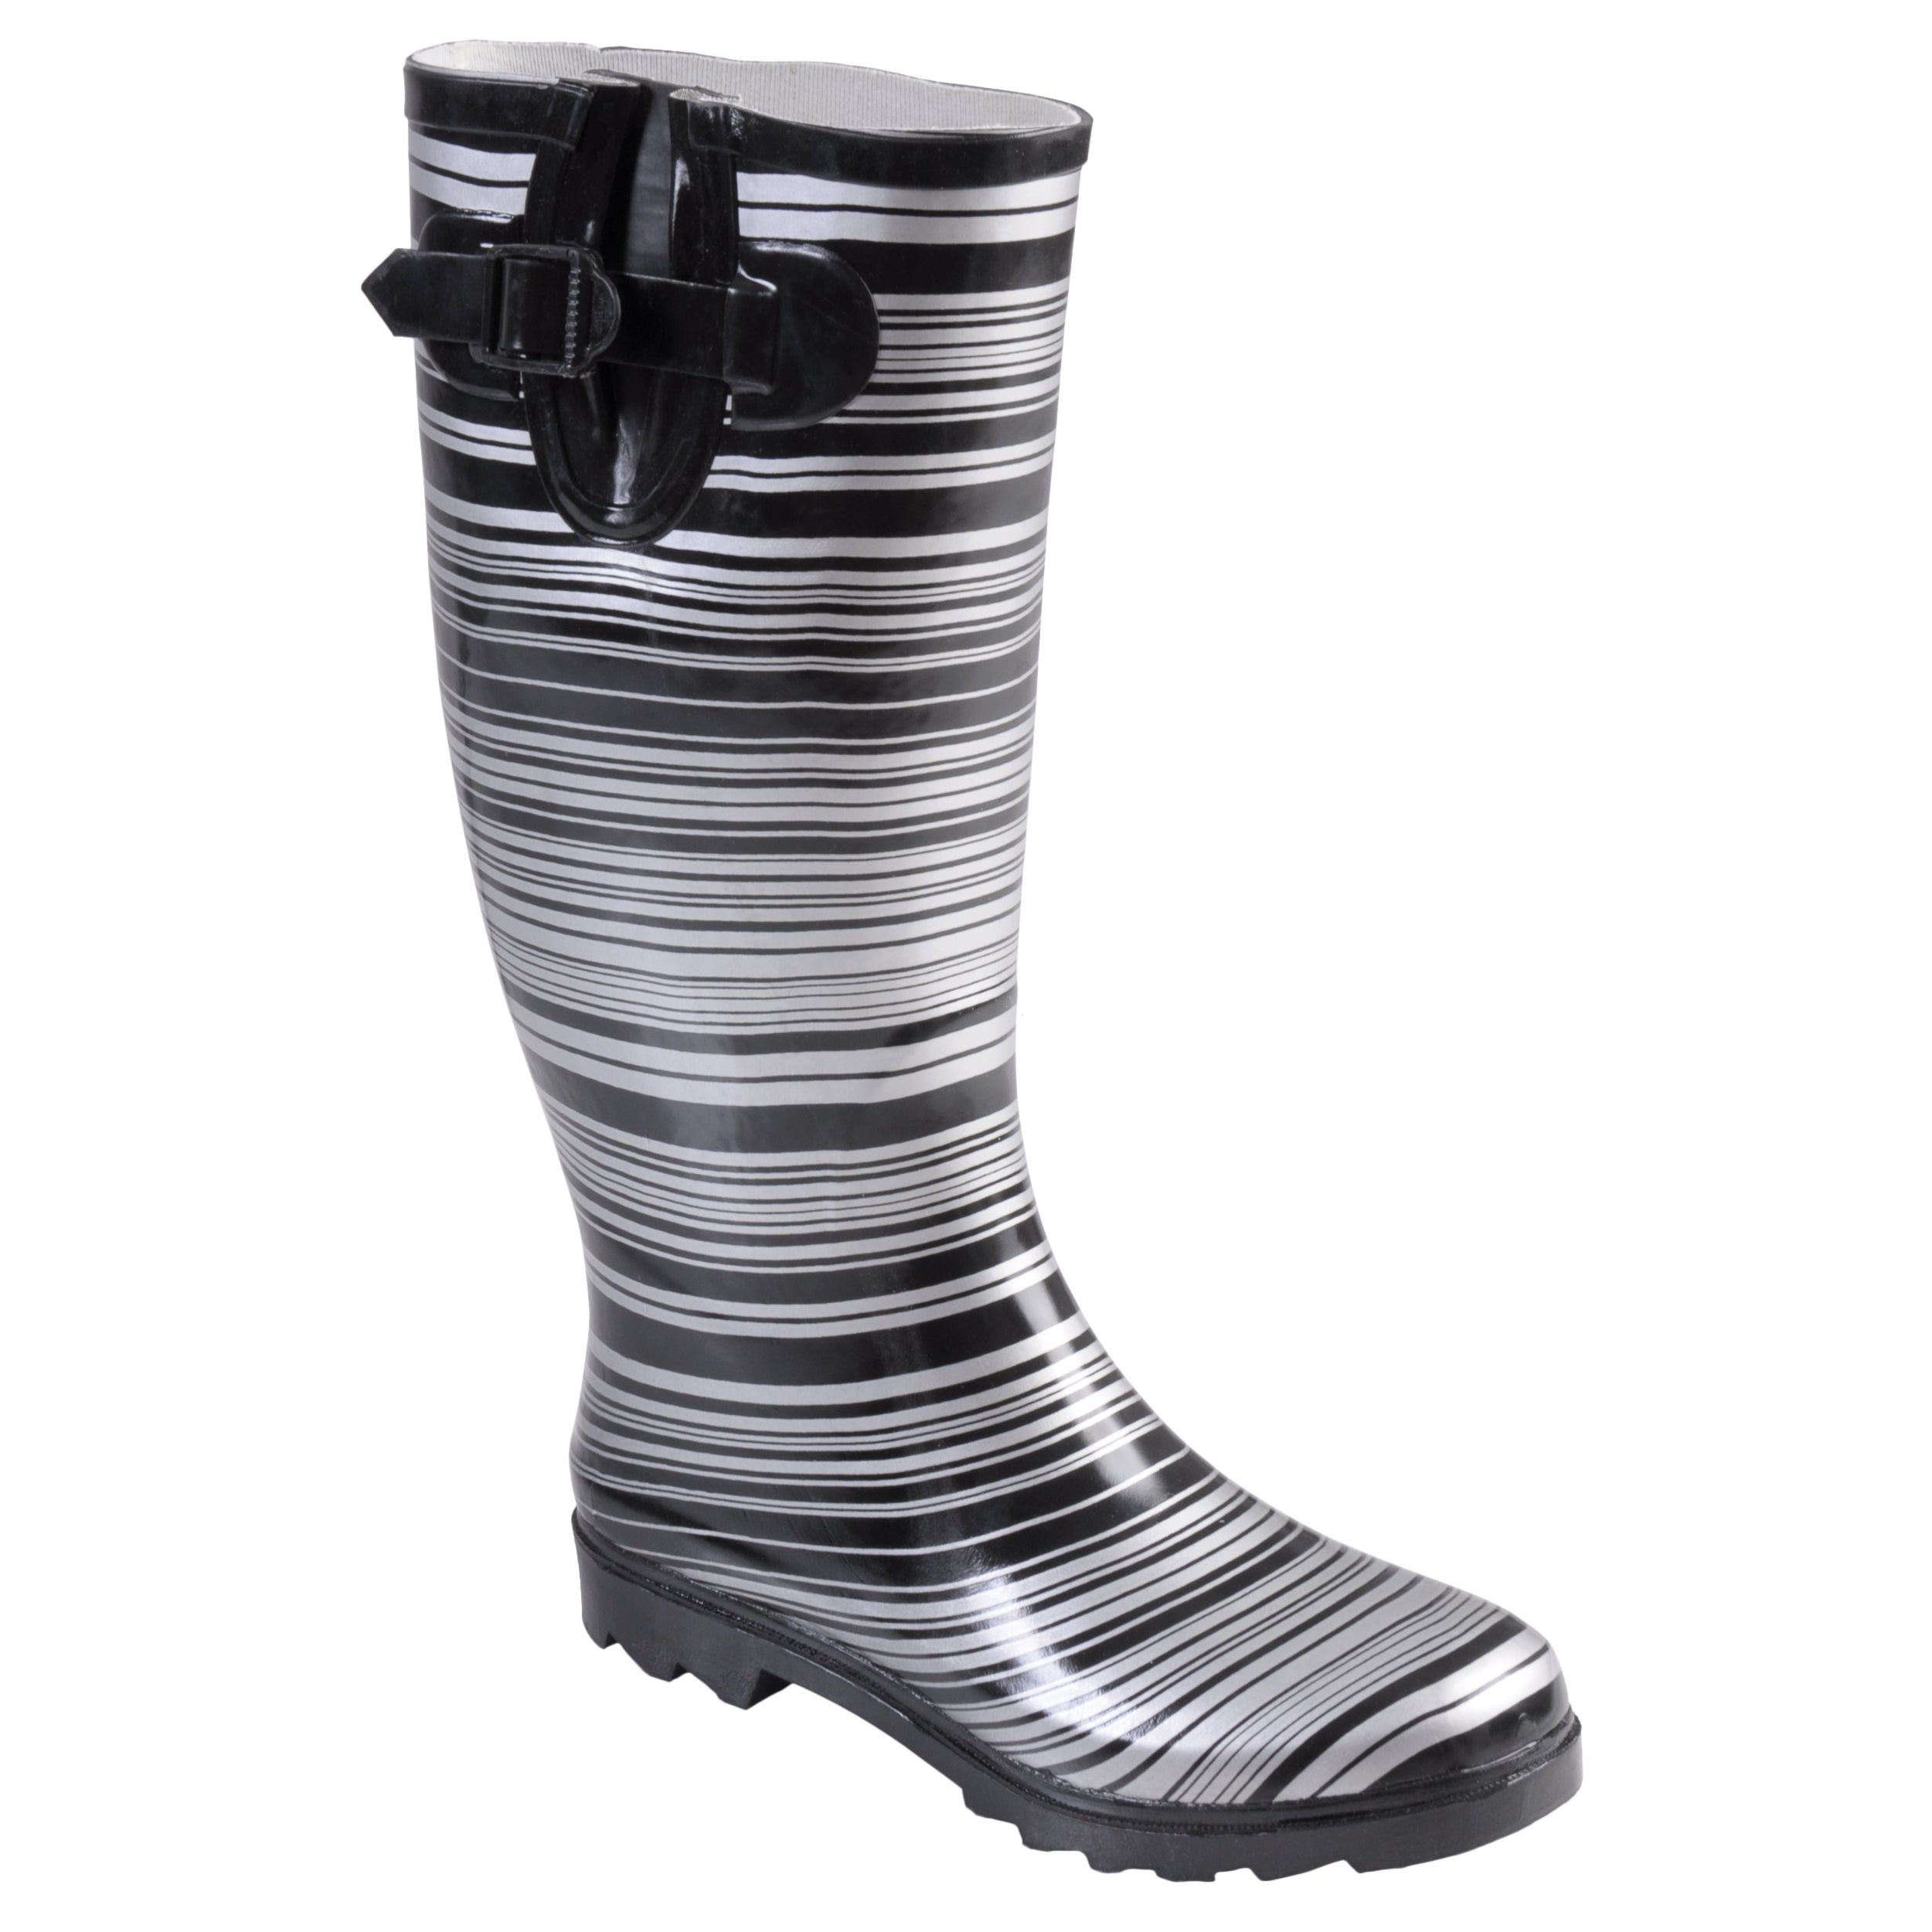 Hailey Jeans Co Women's 'Bette' Striped Rubber Rainboots